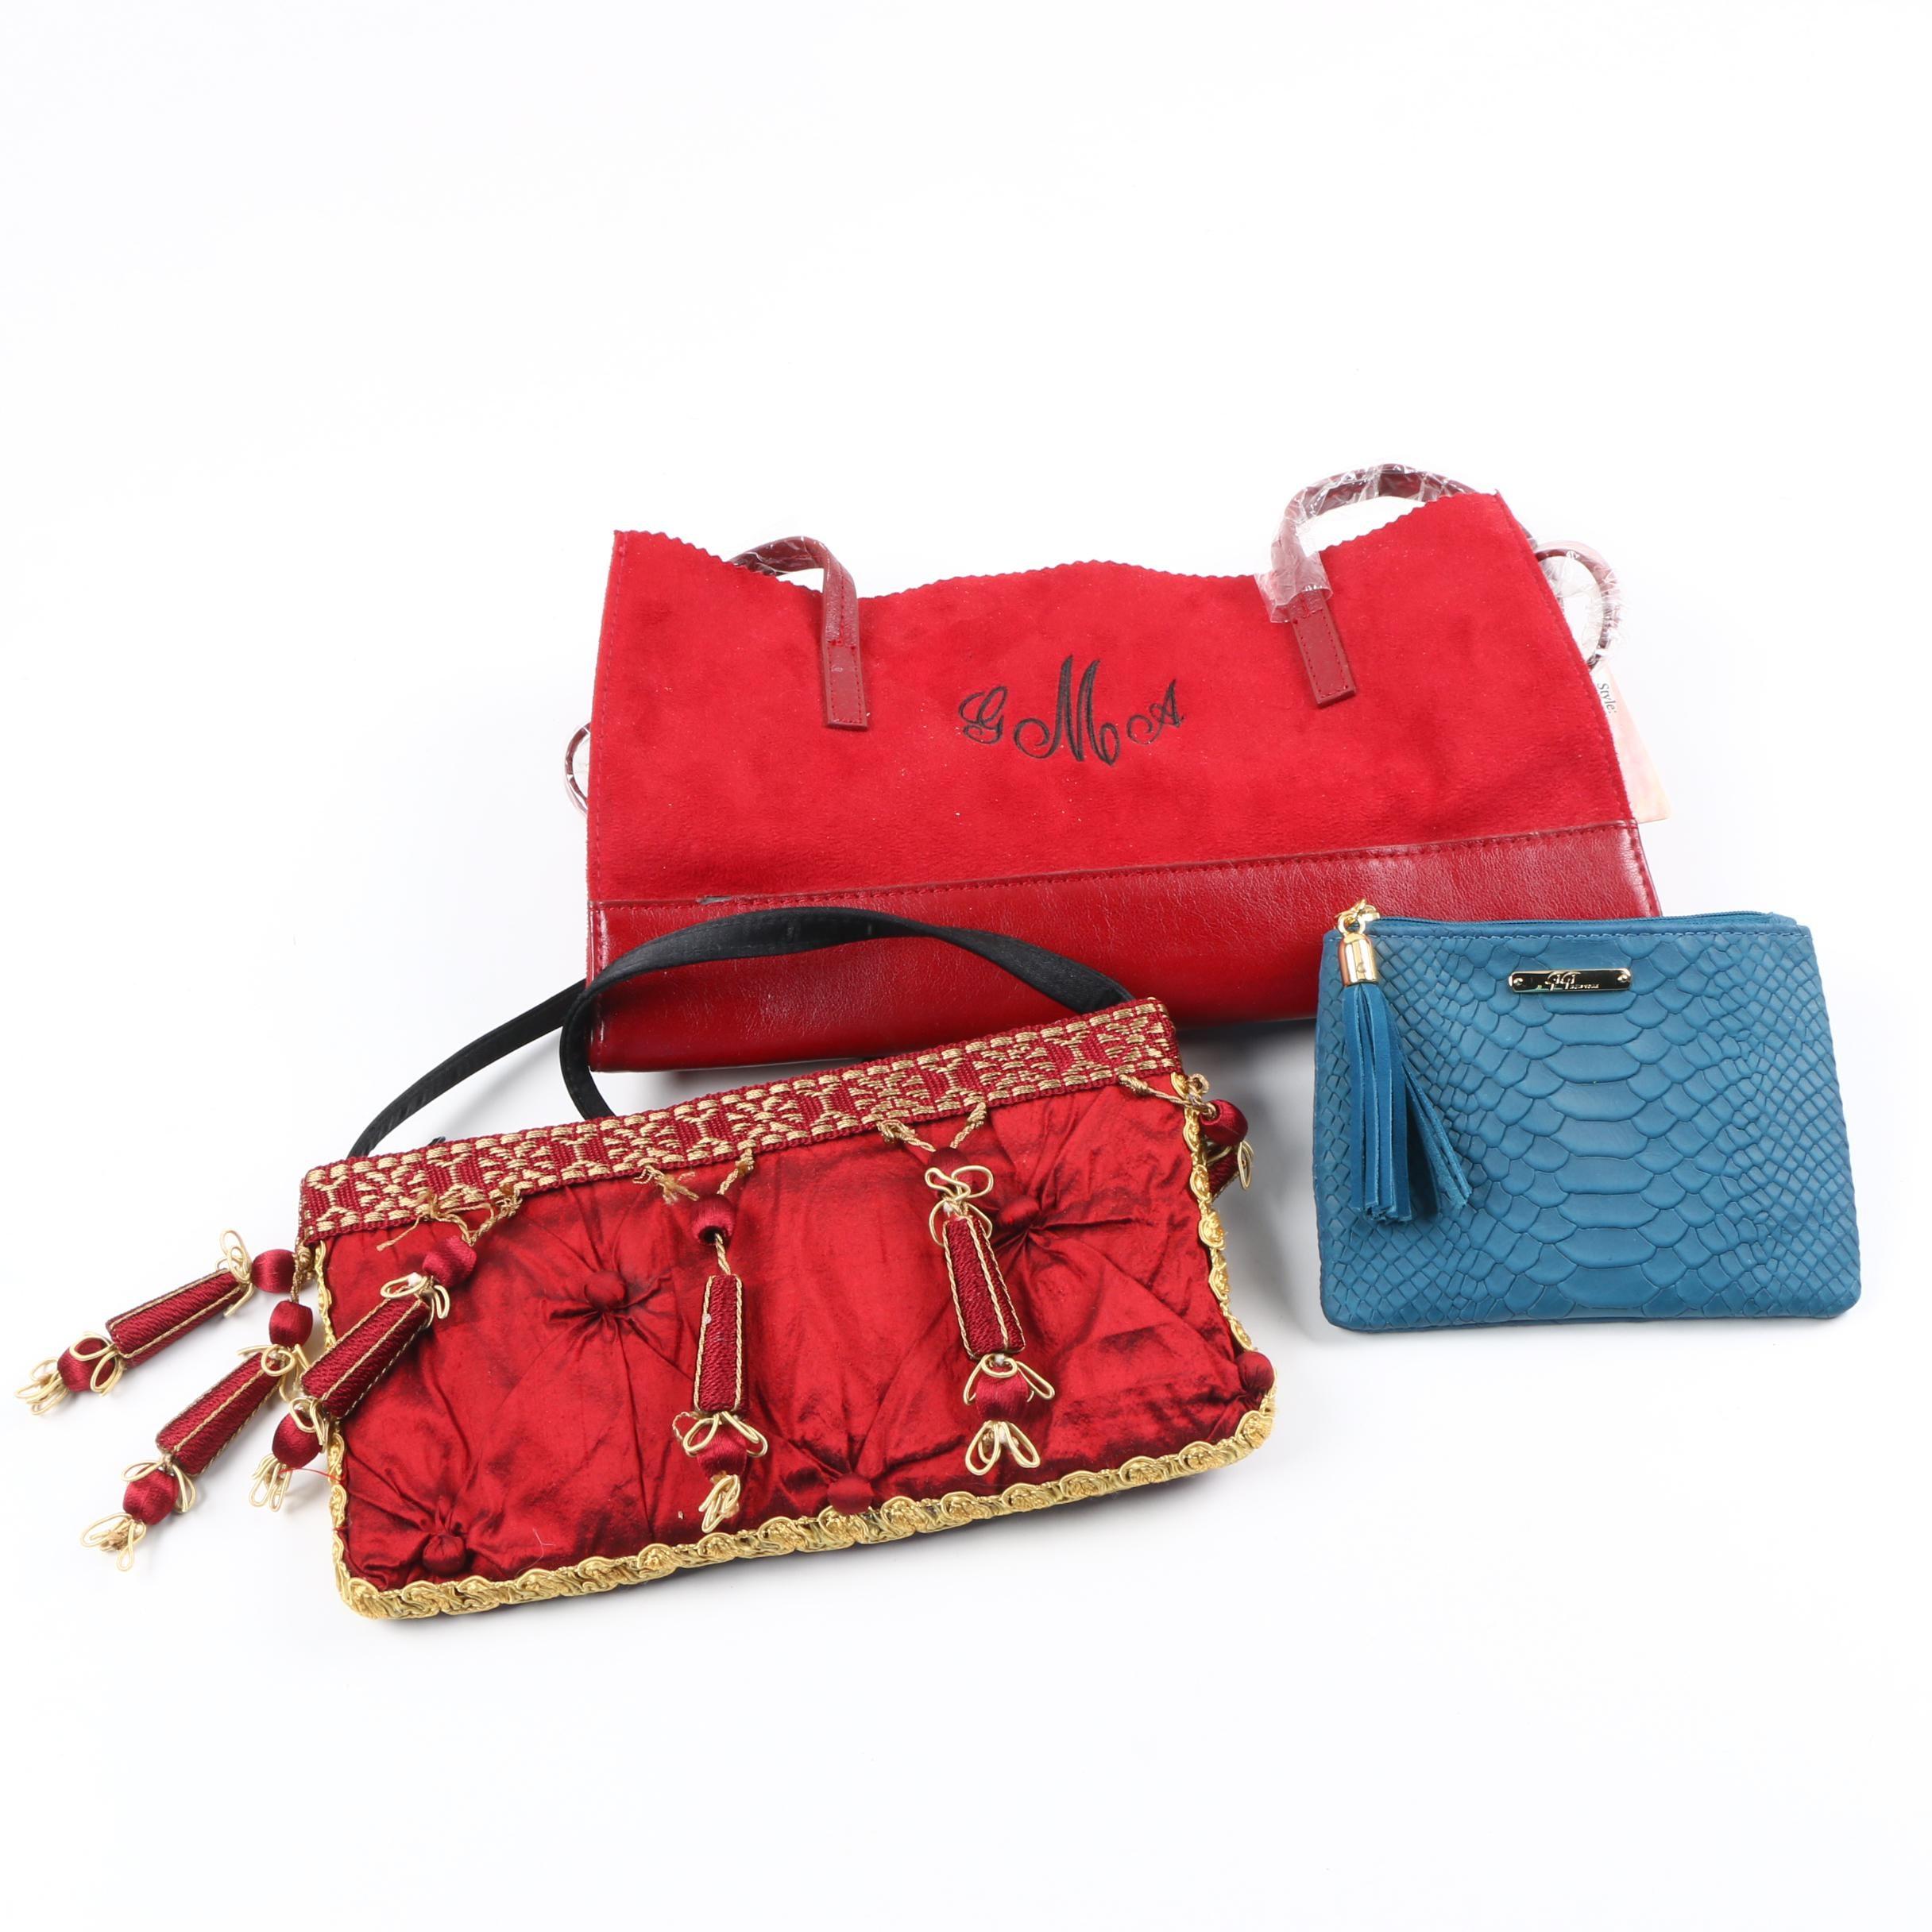 Handbags and GiGi Change Purse